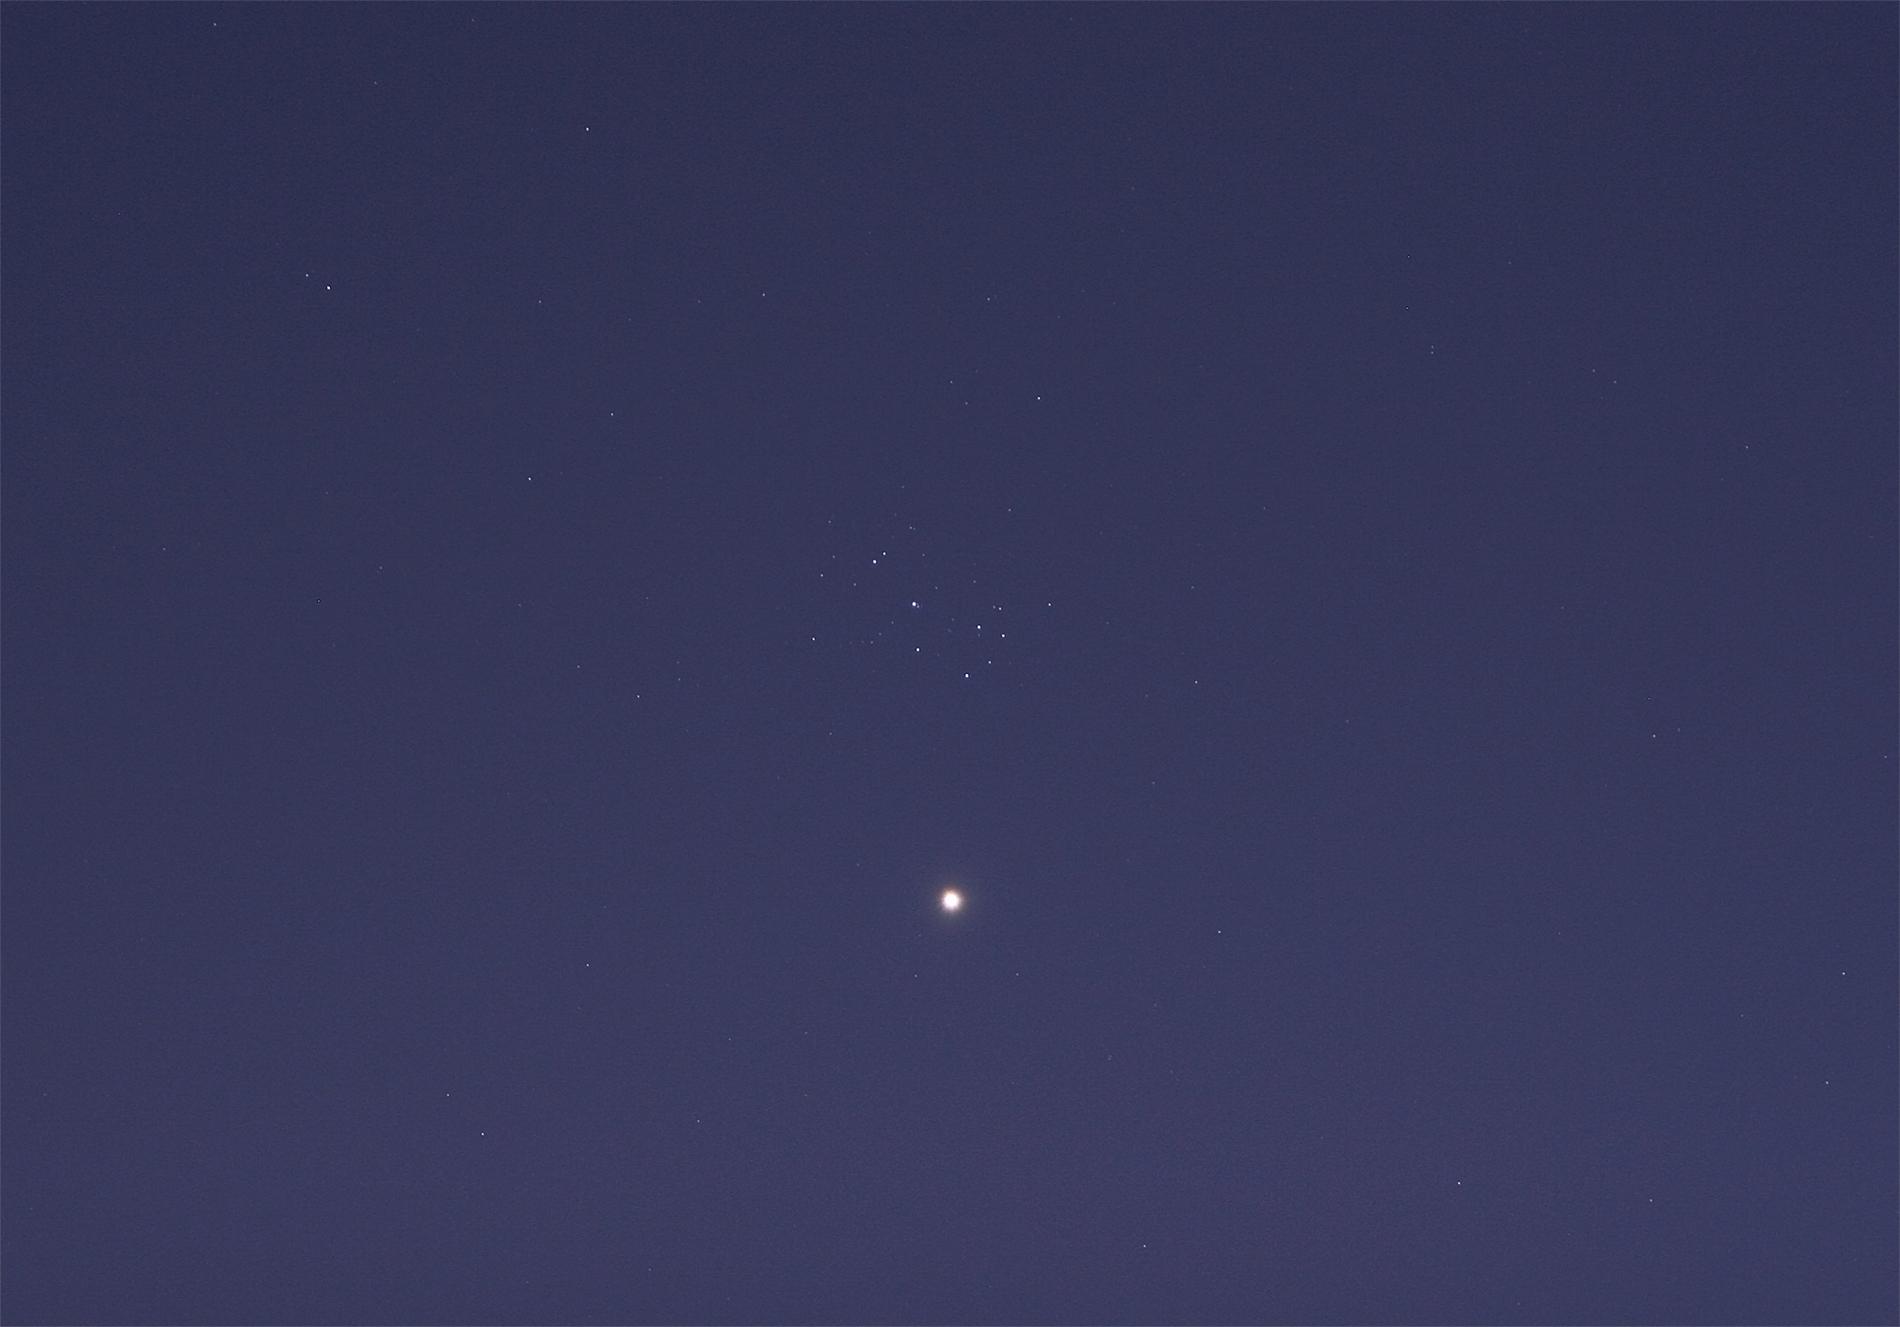 Venere e le Pleiadi. 1 Apr. 2012. © Gianluca Masi